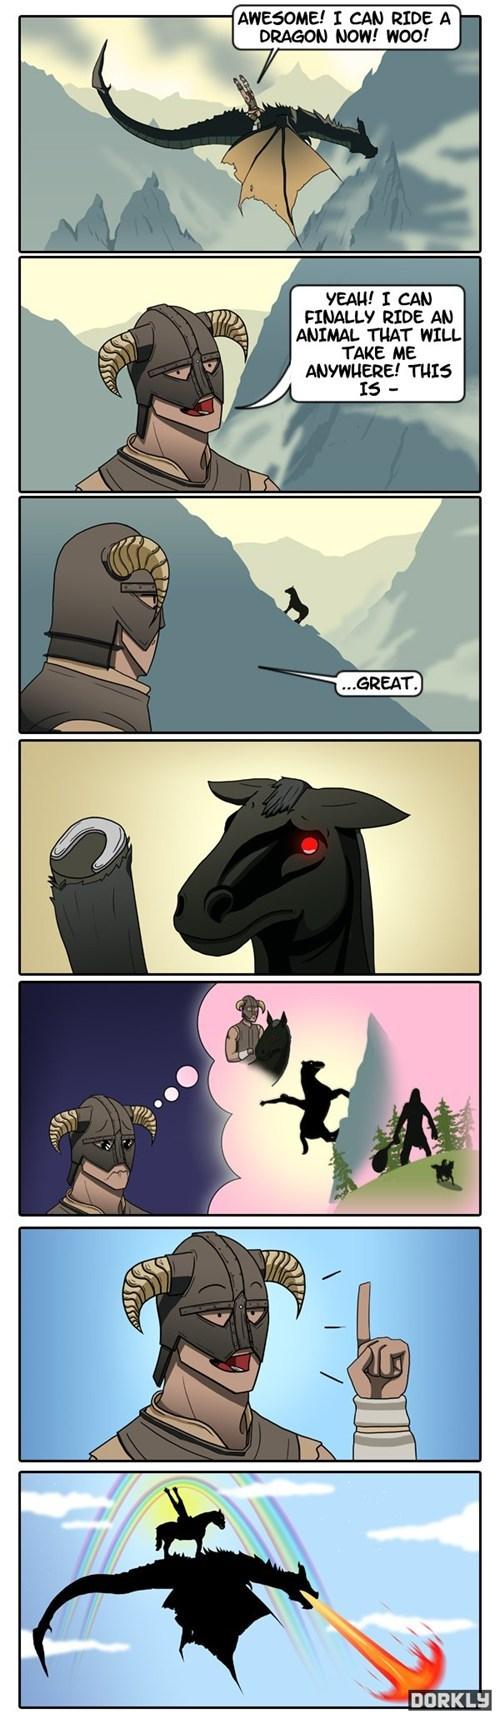 dragonborn dragons comic riding horses Skyrim - 6898763776